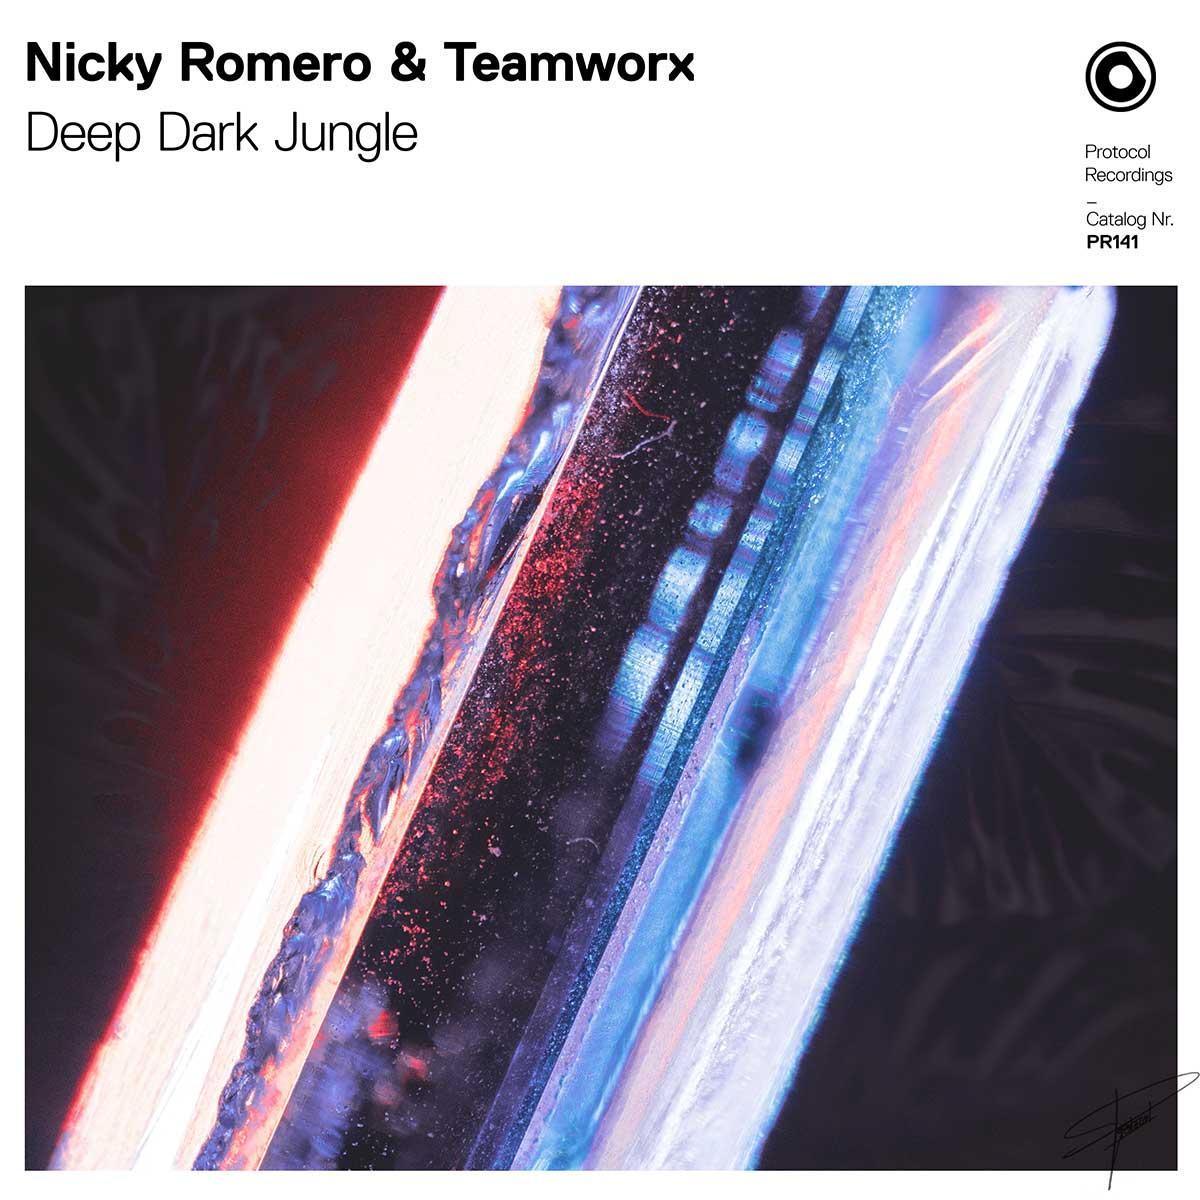 Nicky Romero & Teamworx - Deep Dark Jungle